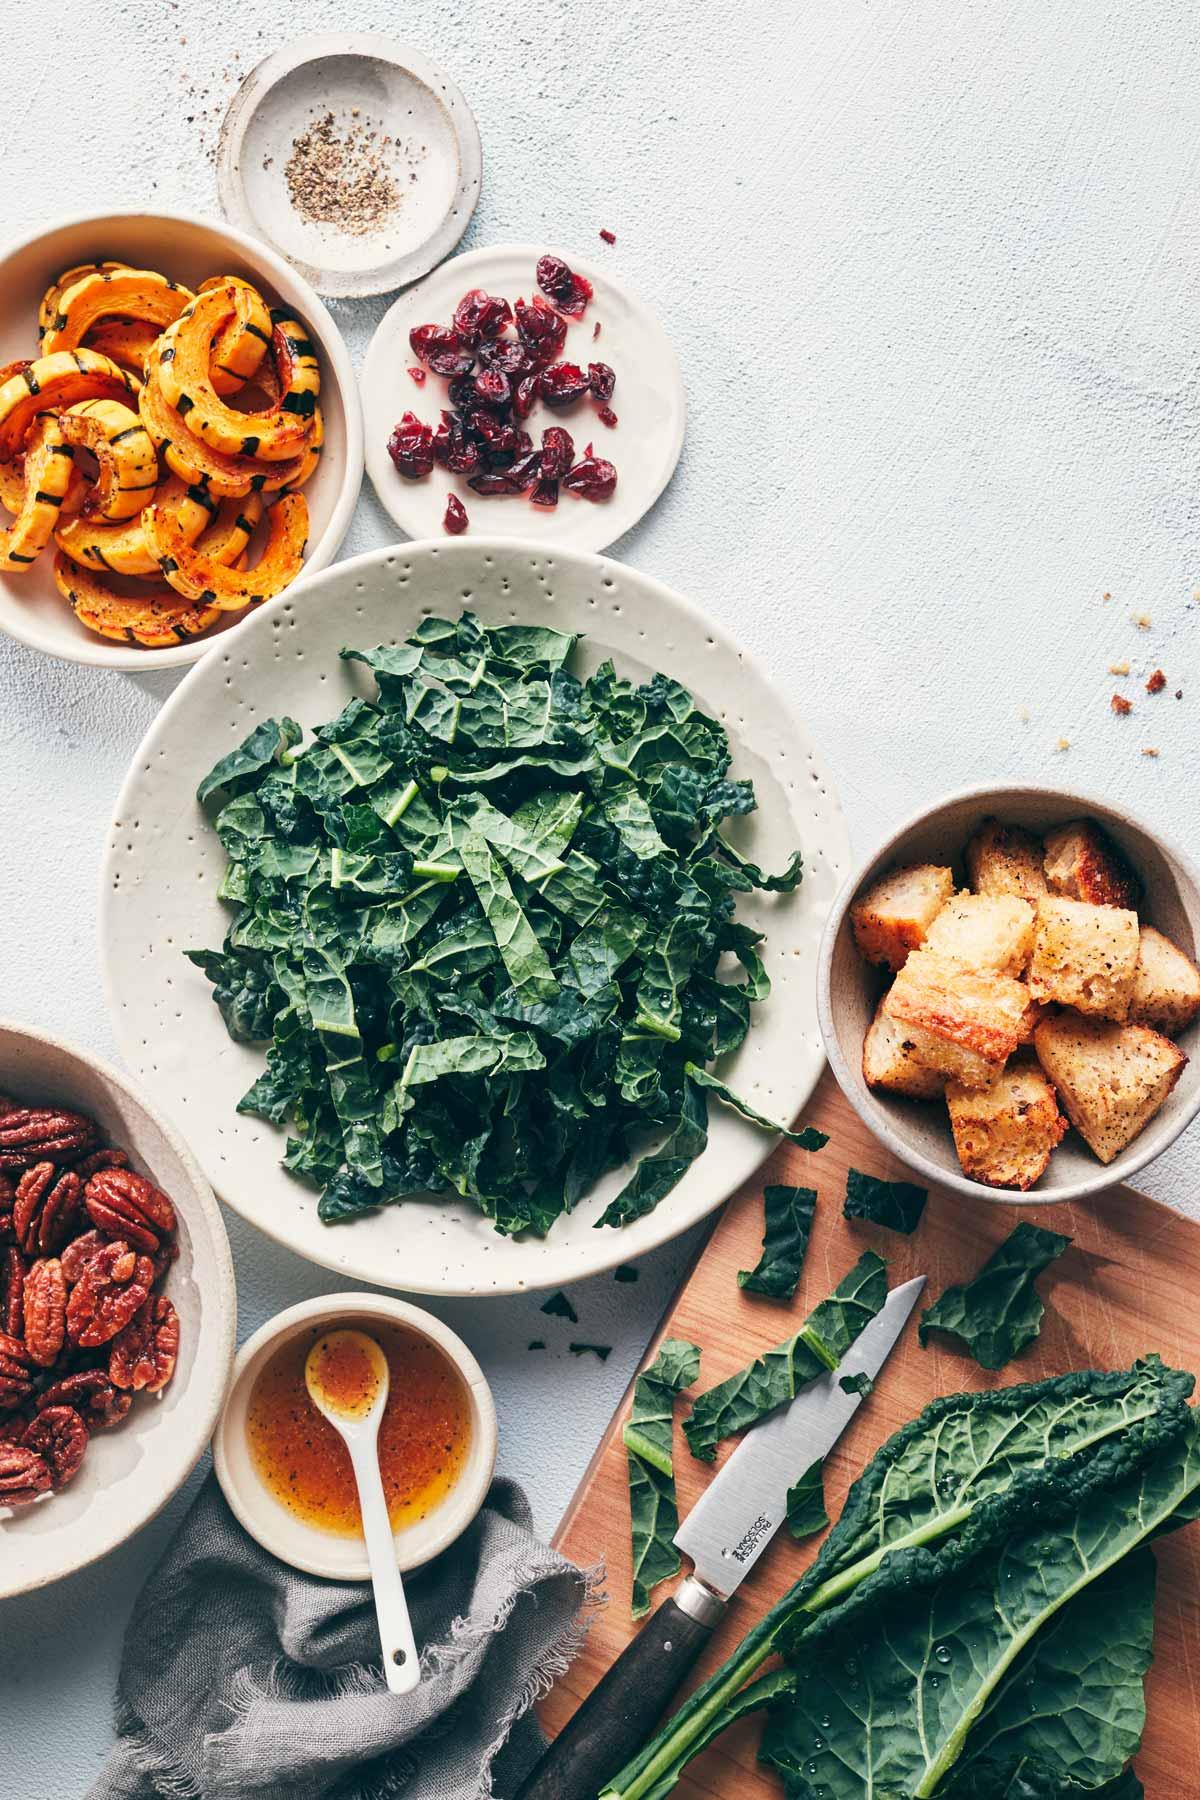 Festive Kale Slaw with Roasted Squash | Evergreen Kitchen | Vegan, Gluten Free (option)